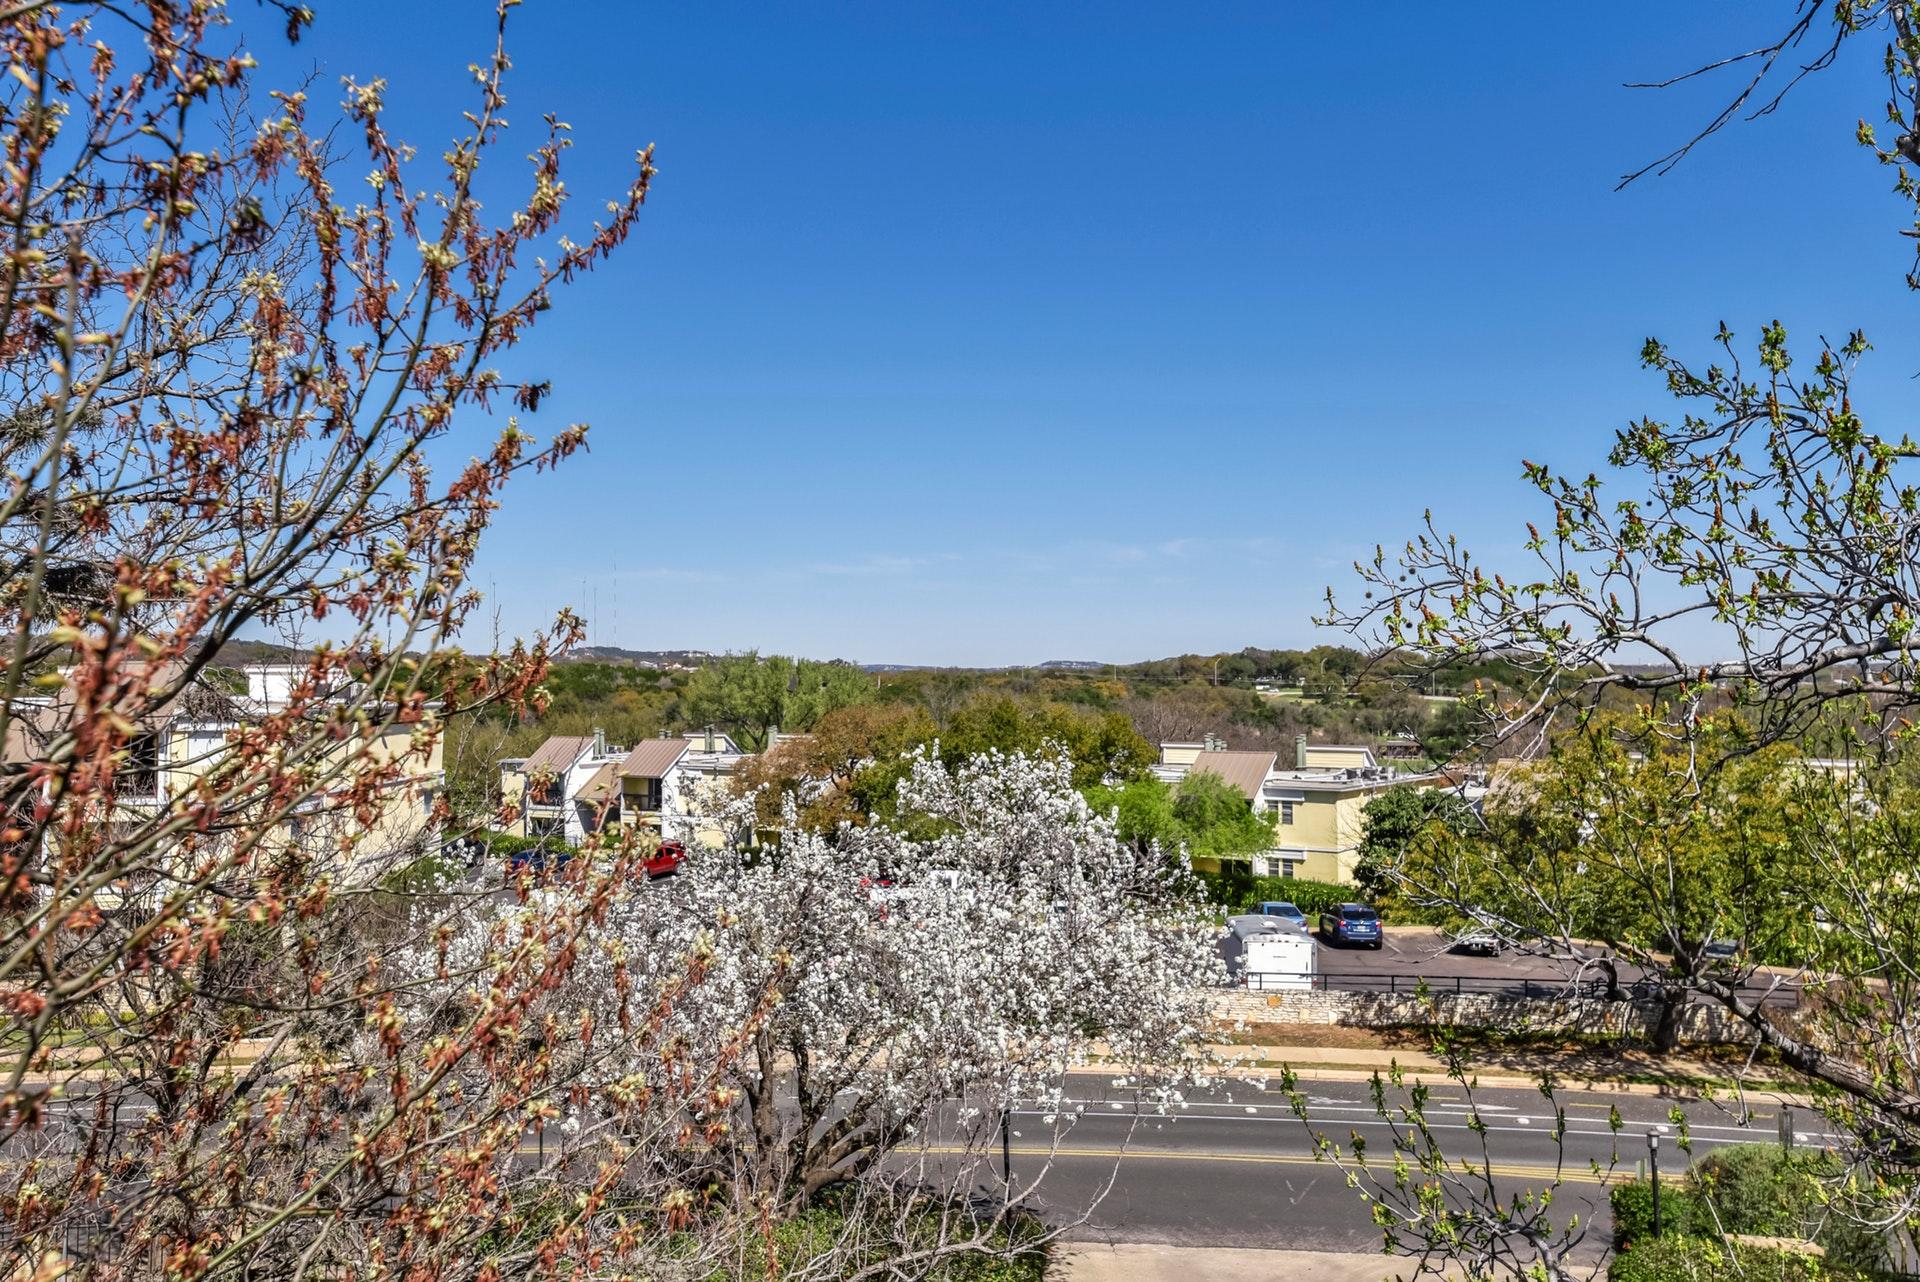 1135 Barton Hills - View